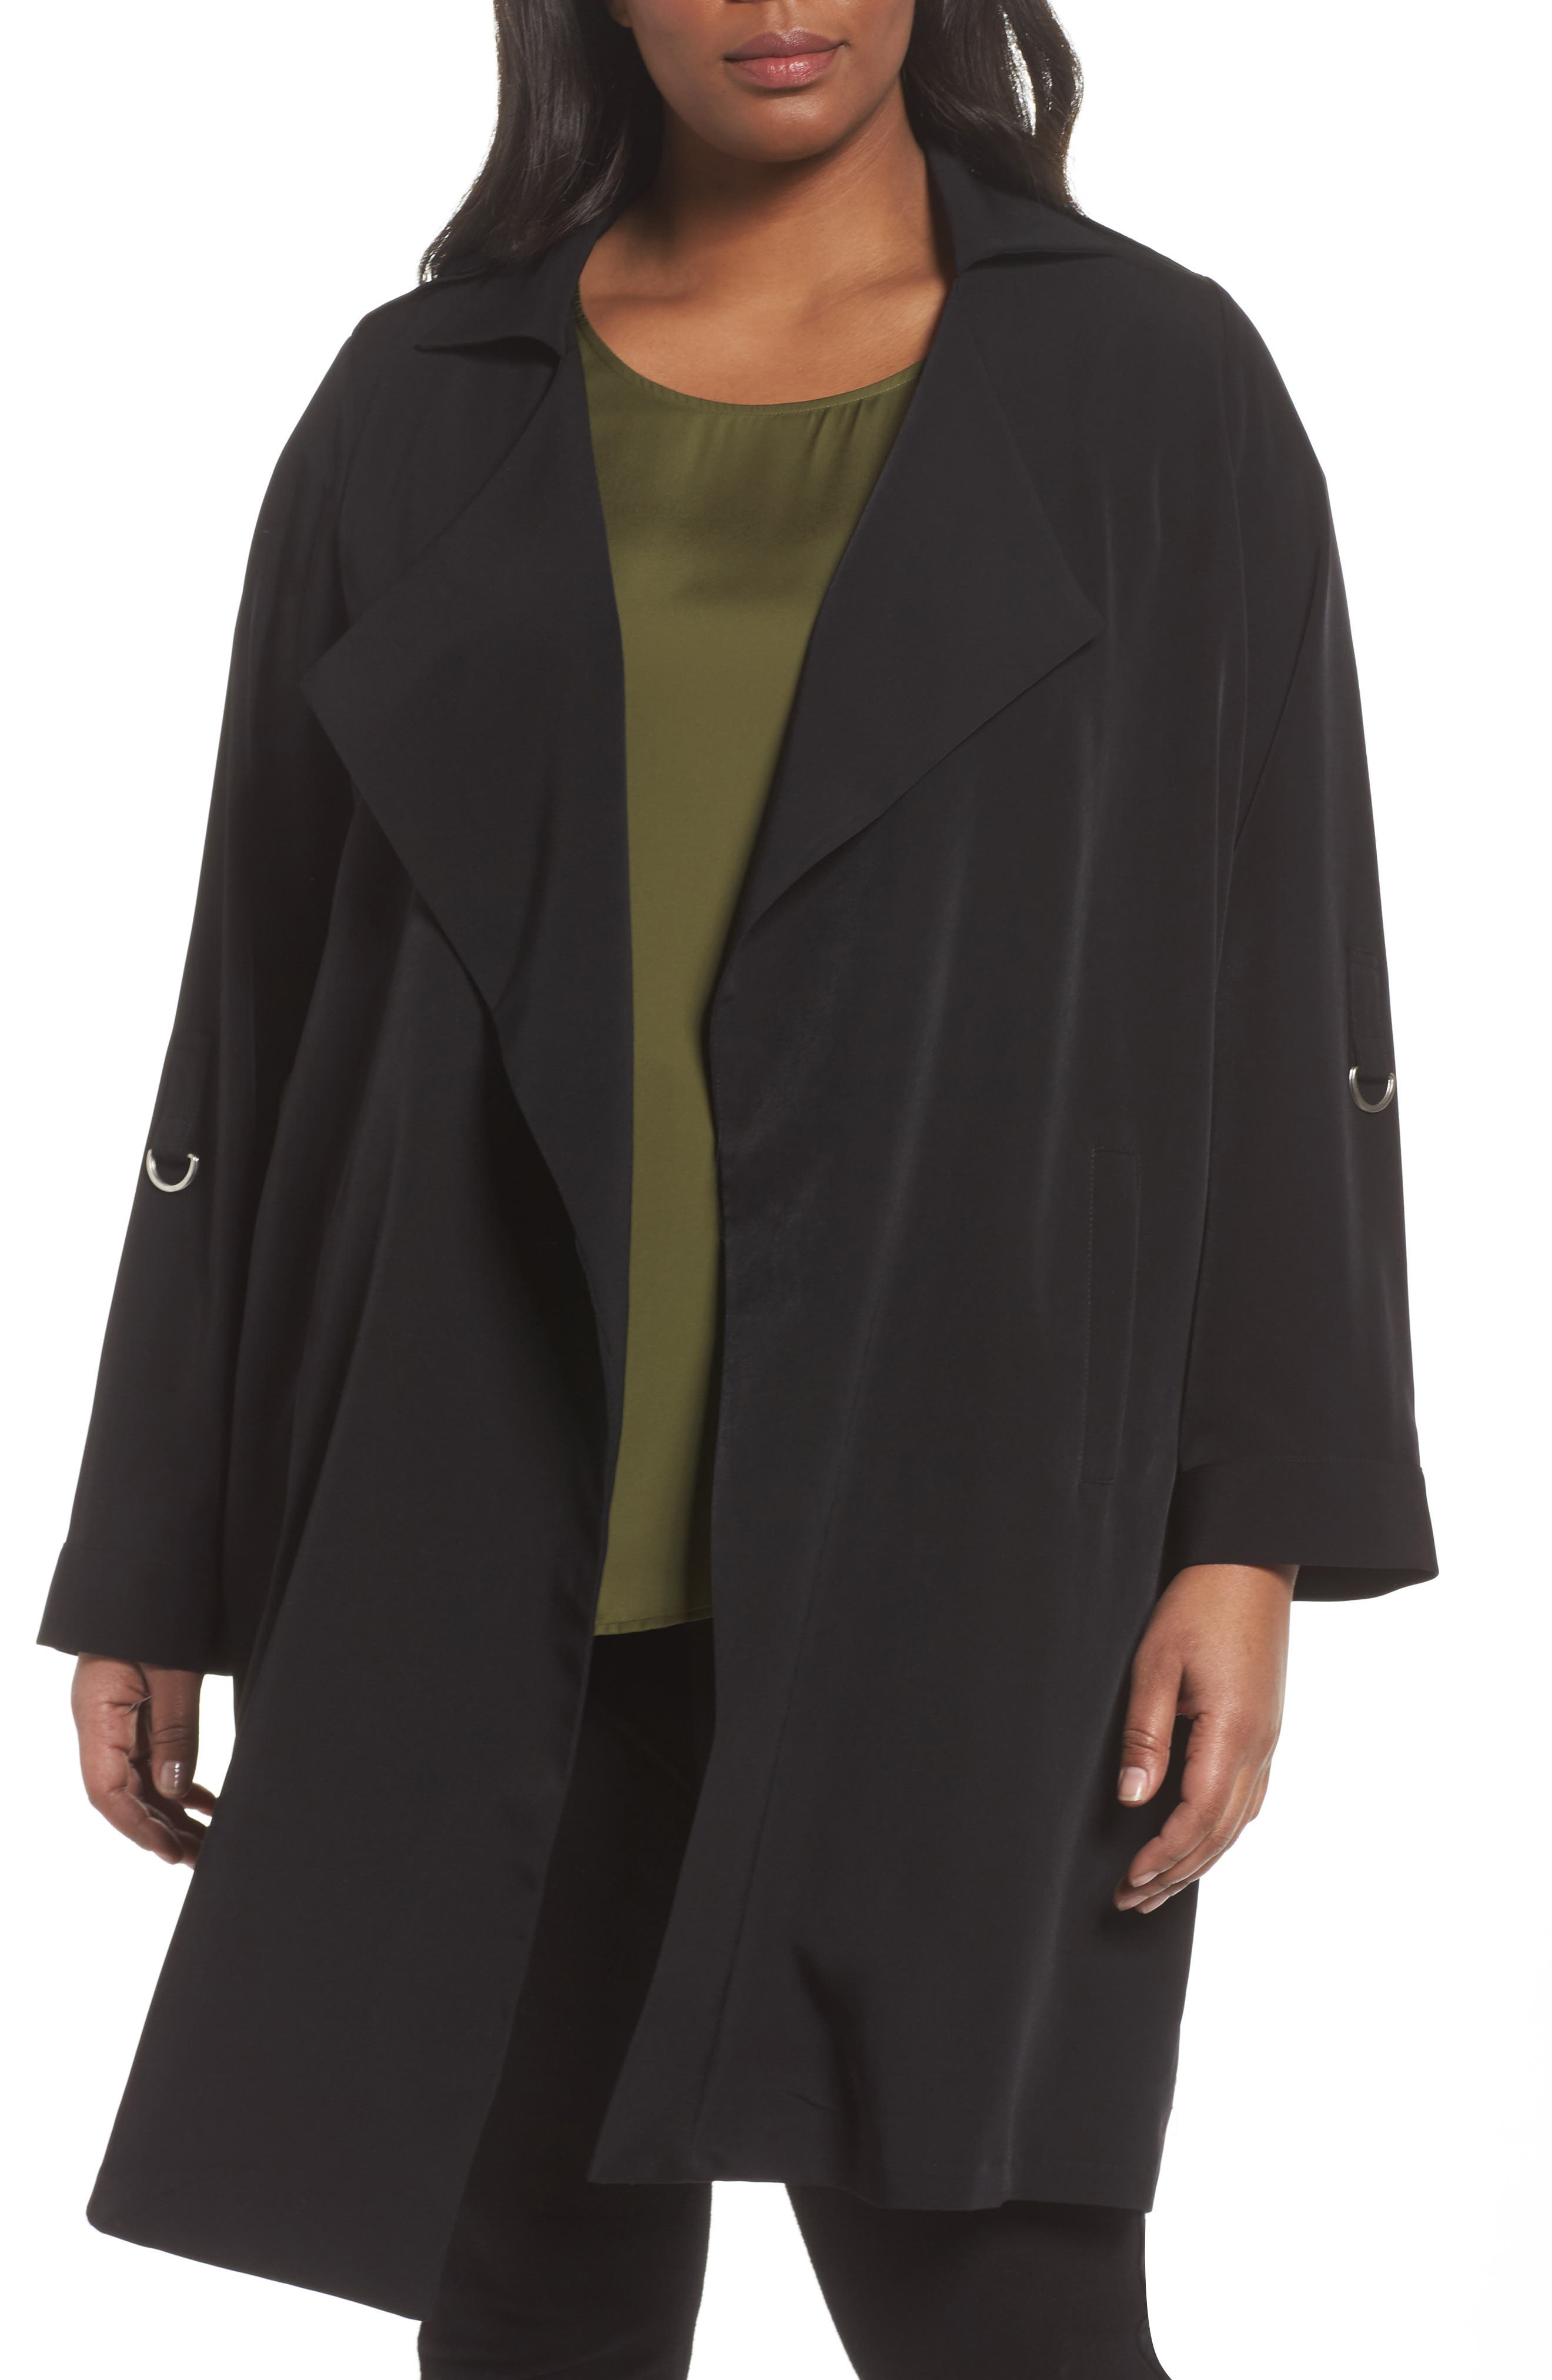 Kaiza Trench Coat,                             Alternate thumbnail 4, color,                             002